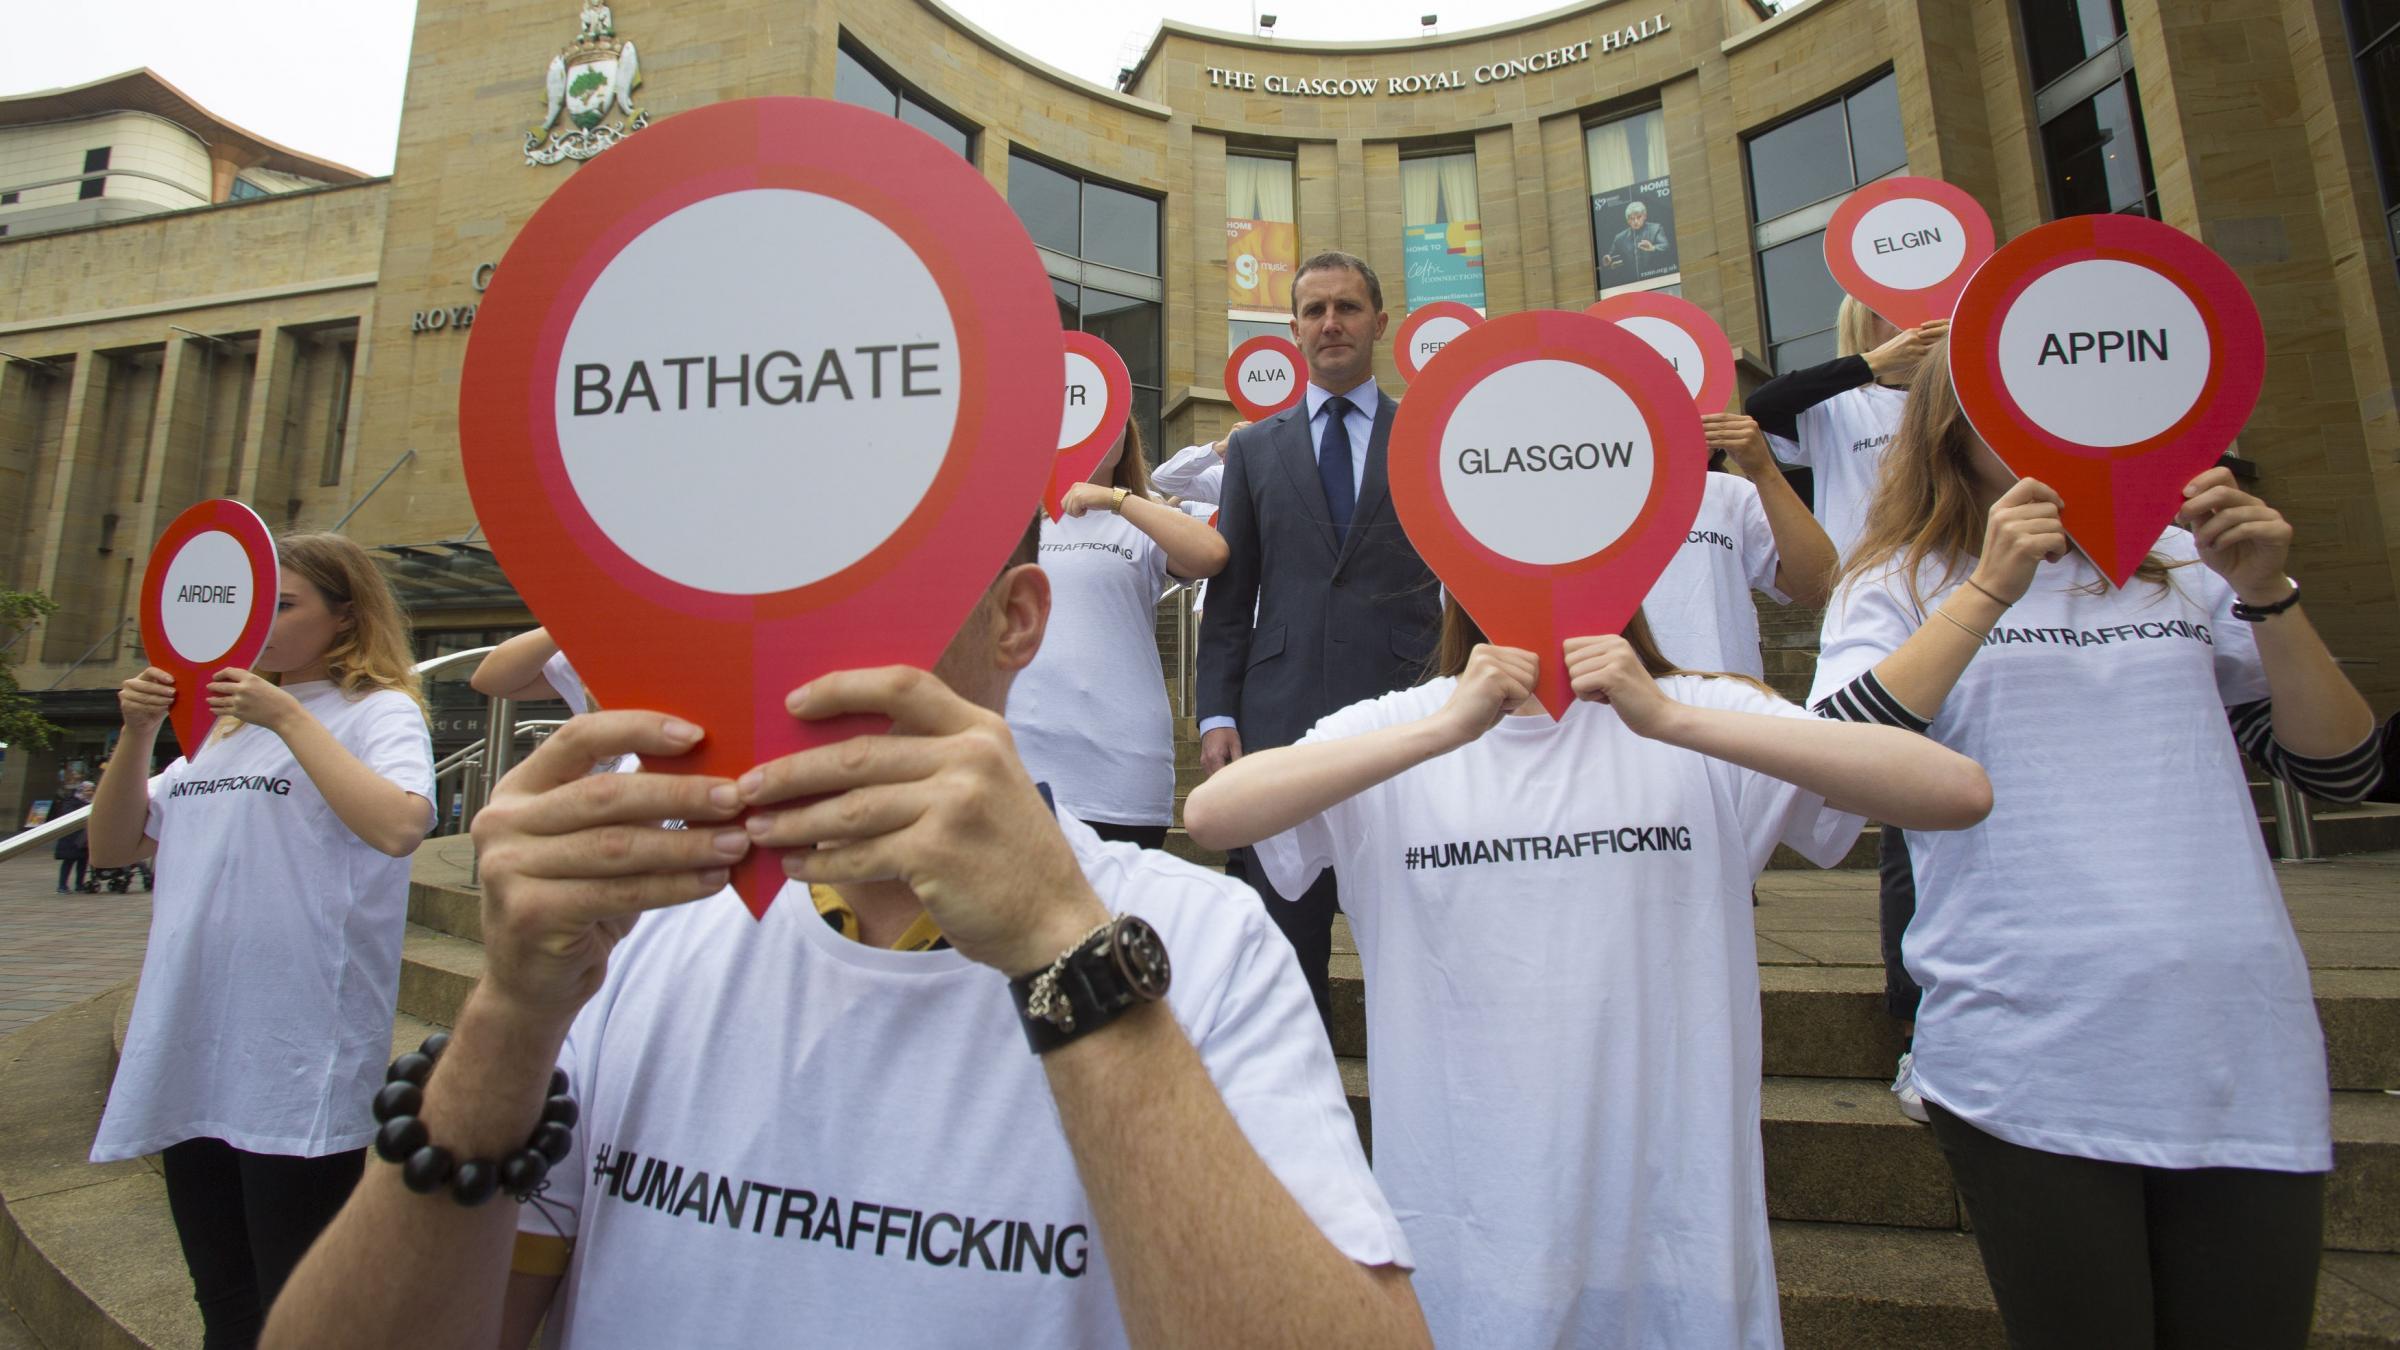 Scottish Government seeks views on legislation to tackle human trafficking